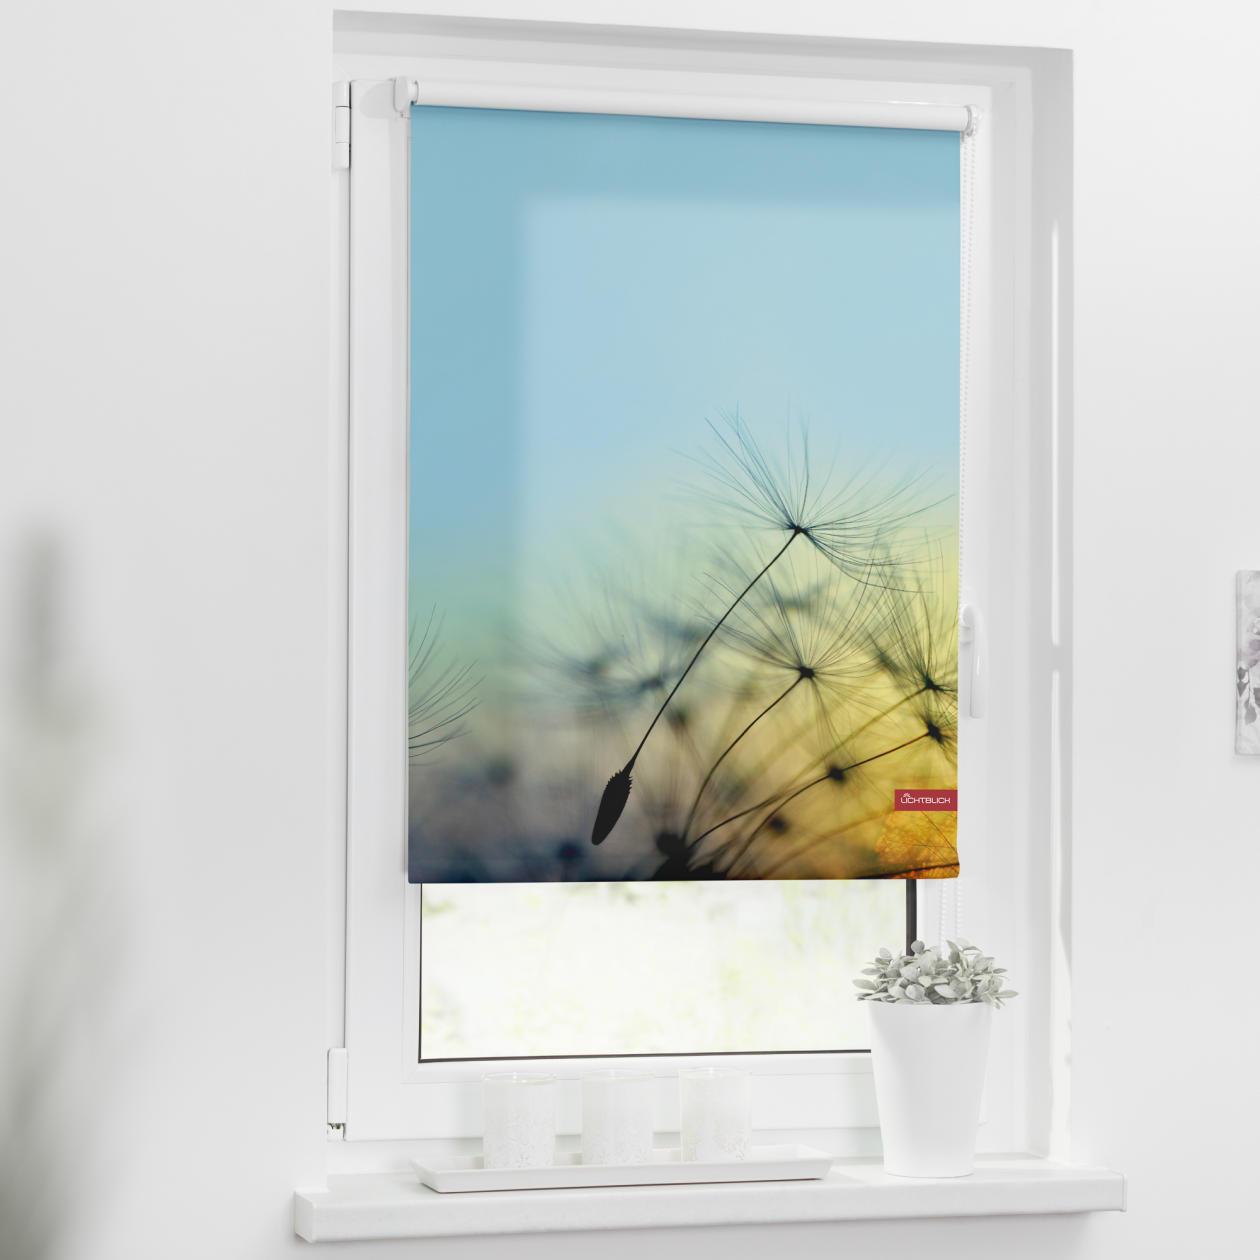 rollo klemmfix ohne bohren blickdicht pusteblume blau lichblick shop. Black Bedroom Furniture Sets. Home Design Ideas